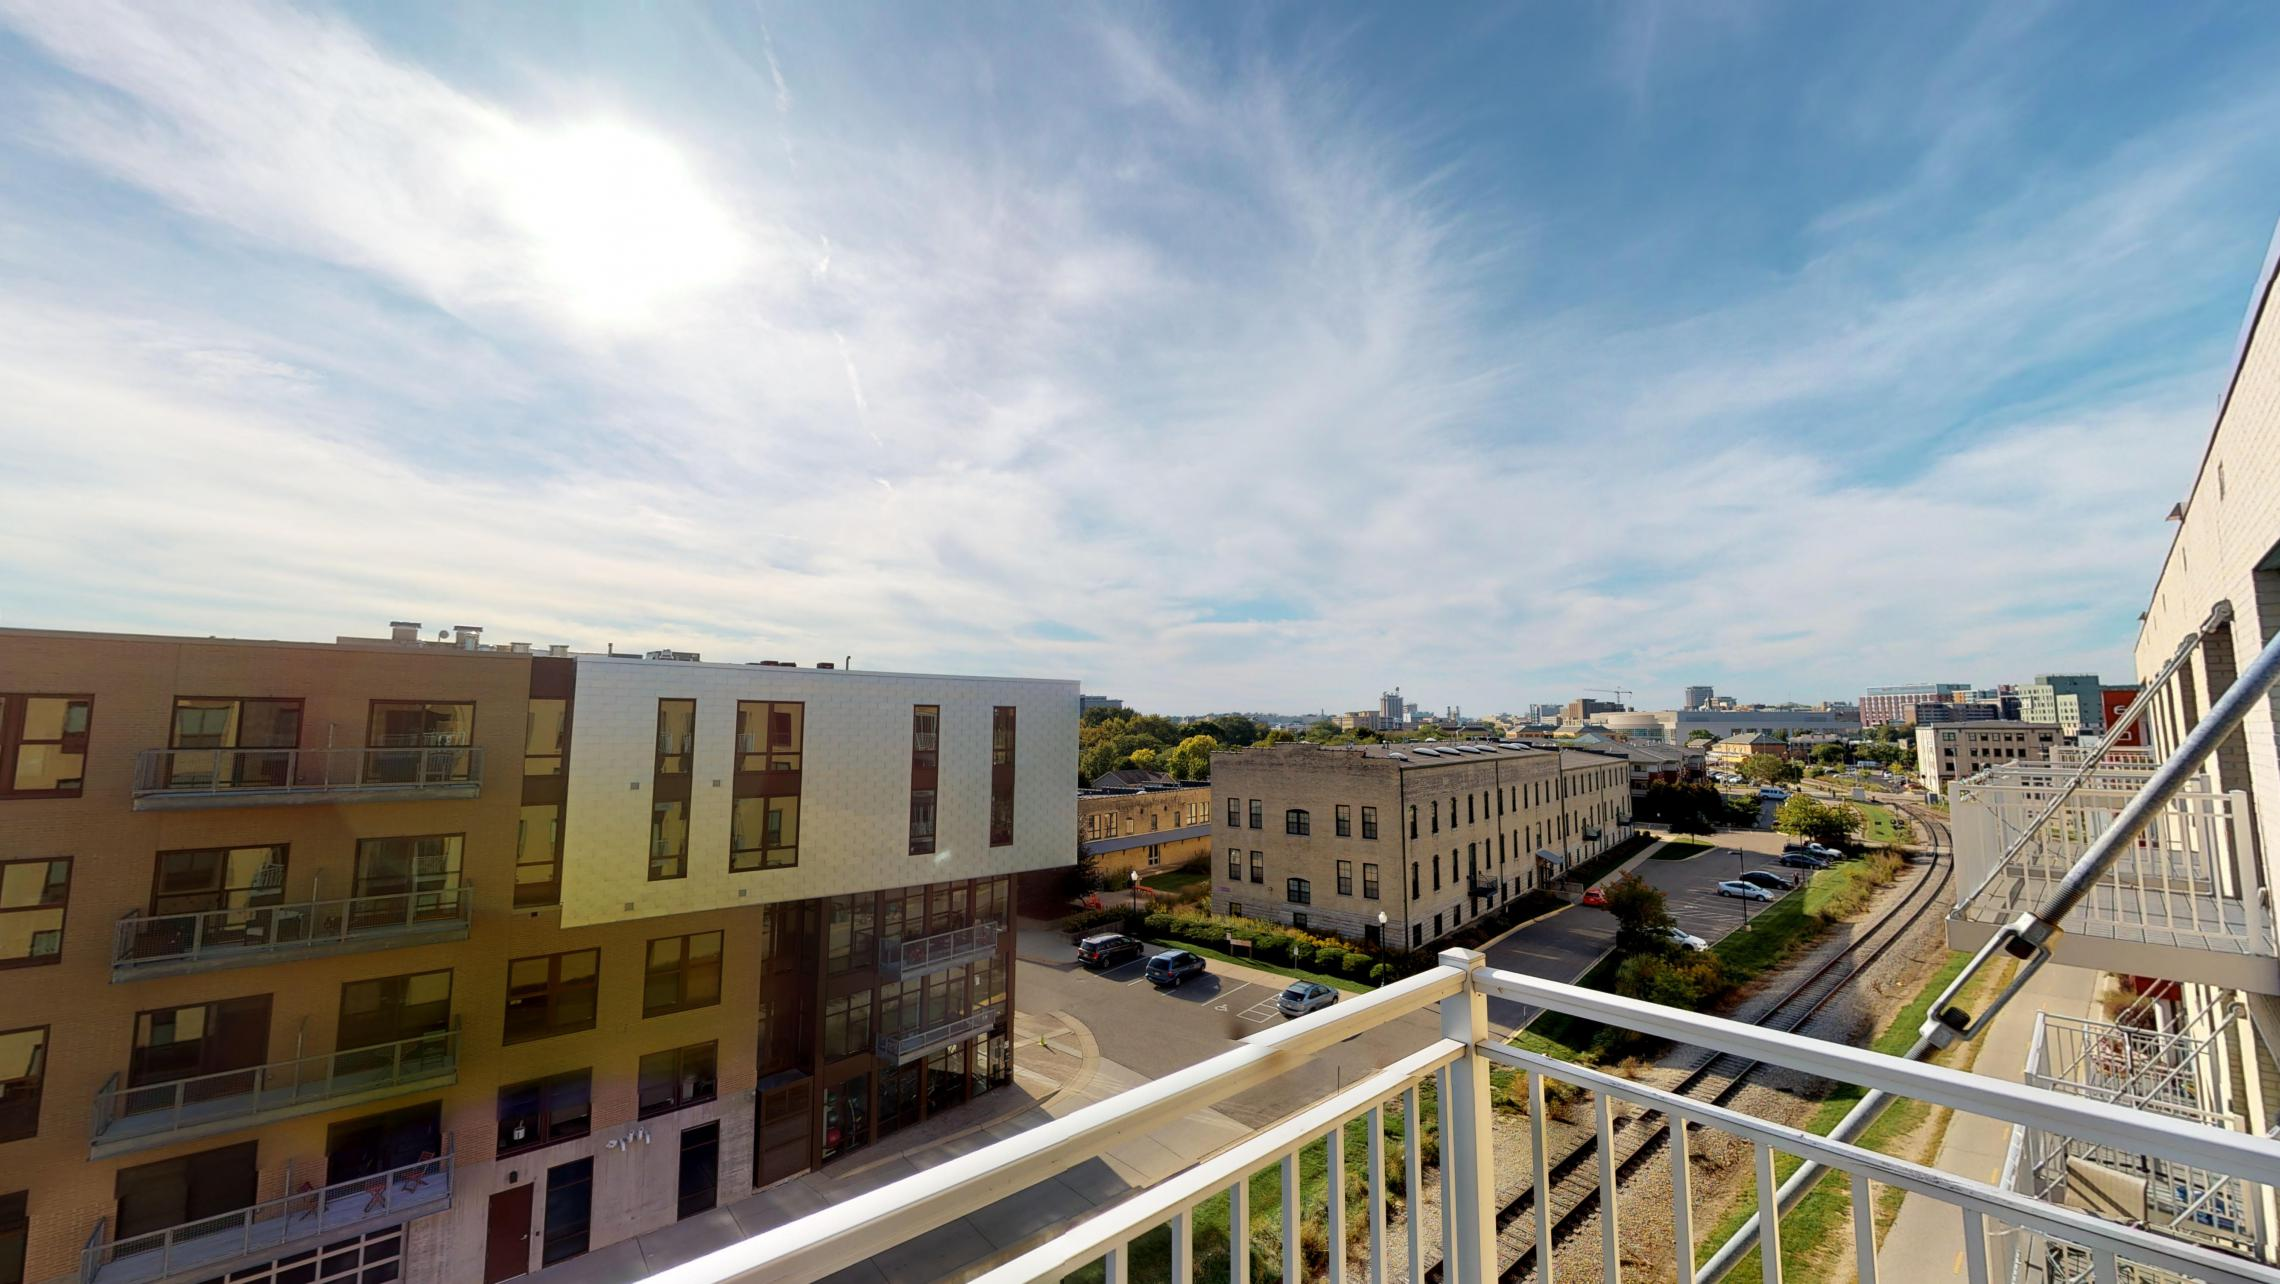 Nine-Line-Apartment-520-Top floor-modern-luxury-downtown-lake-view-madison-upscale-lifestyle.jpg